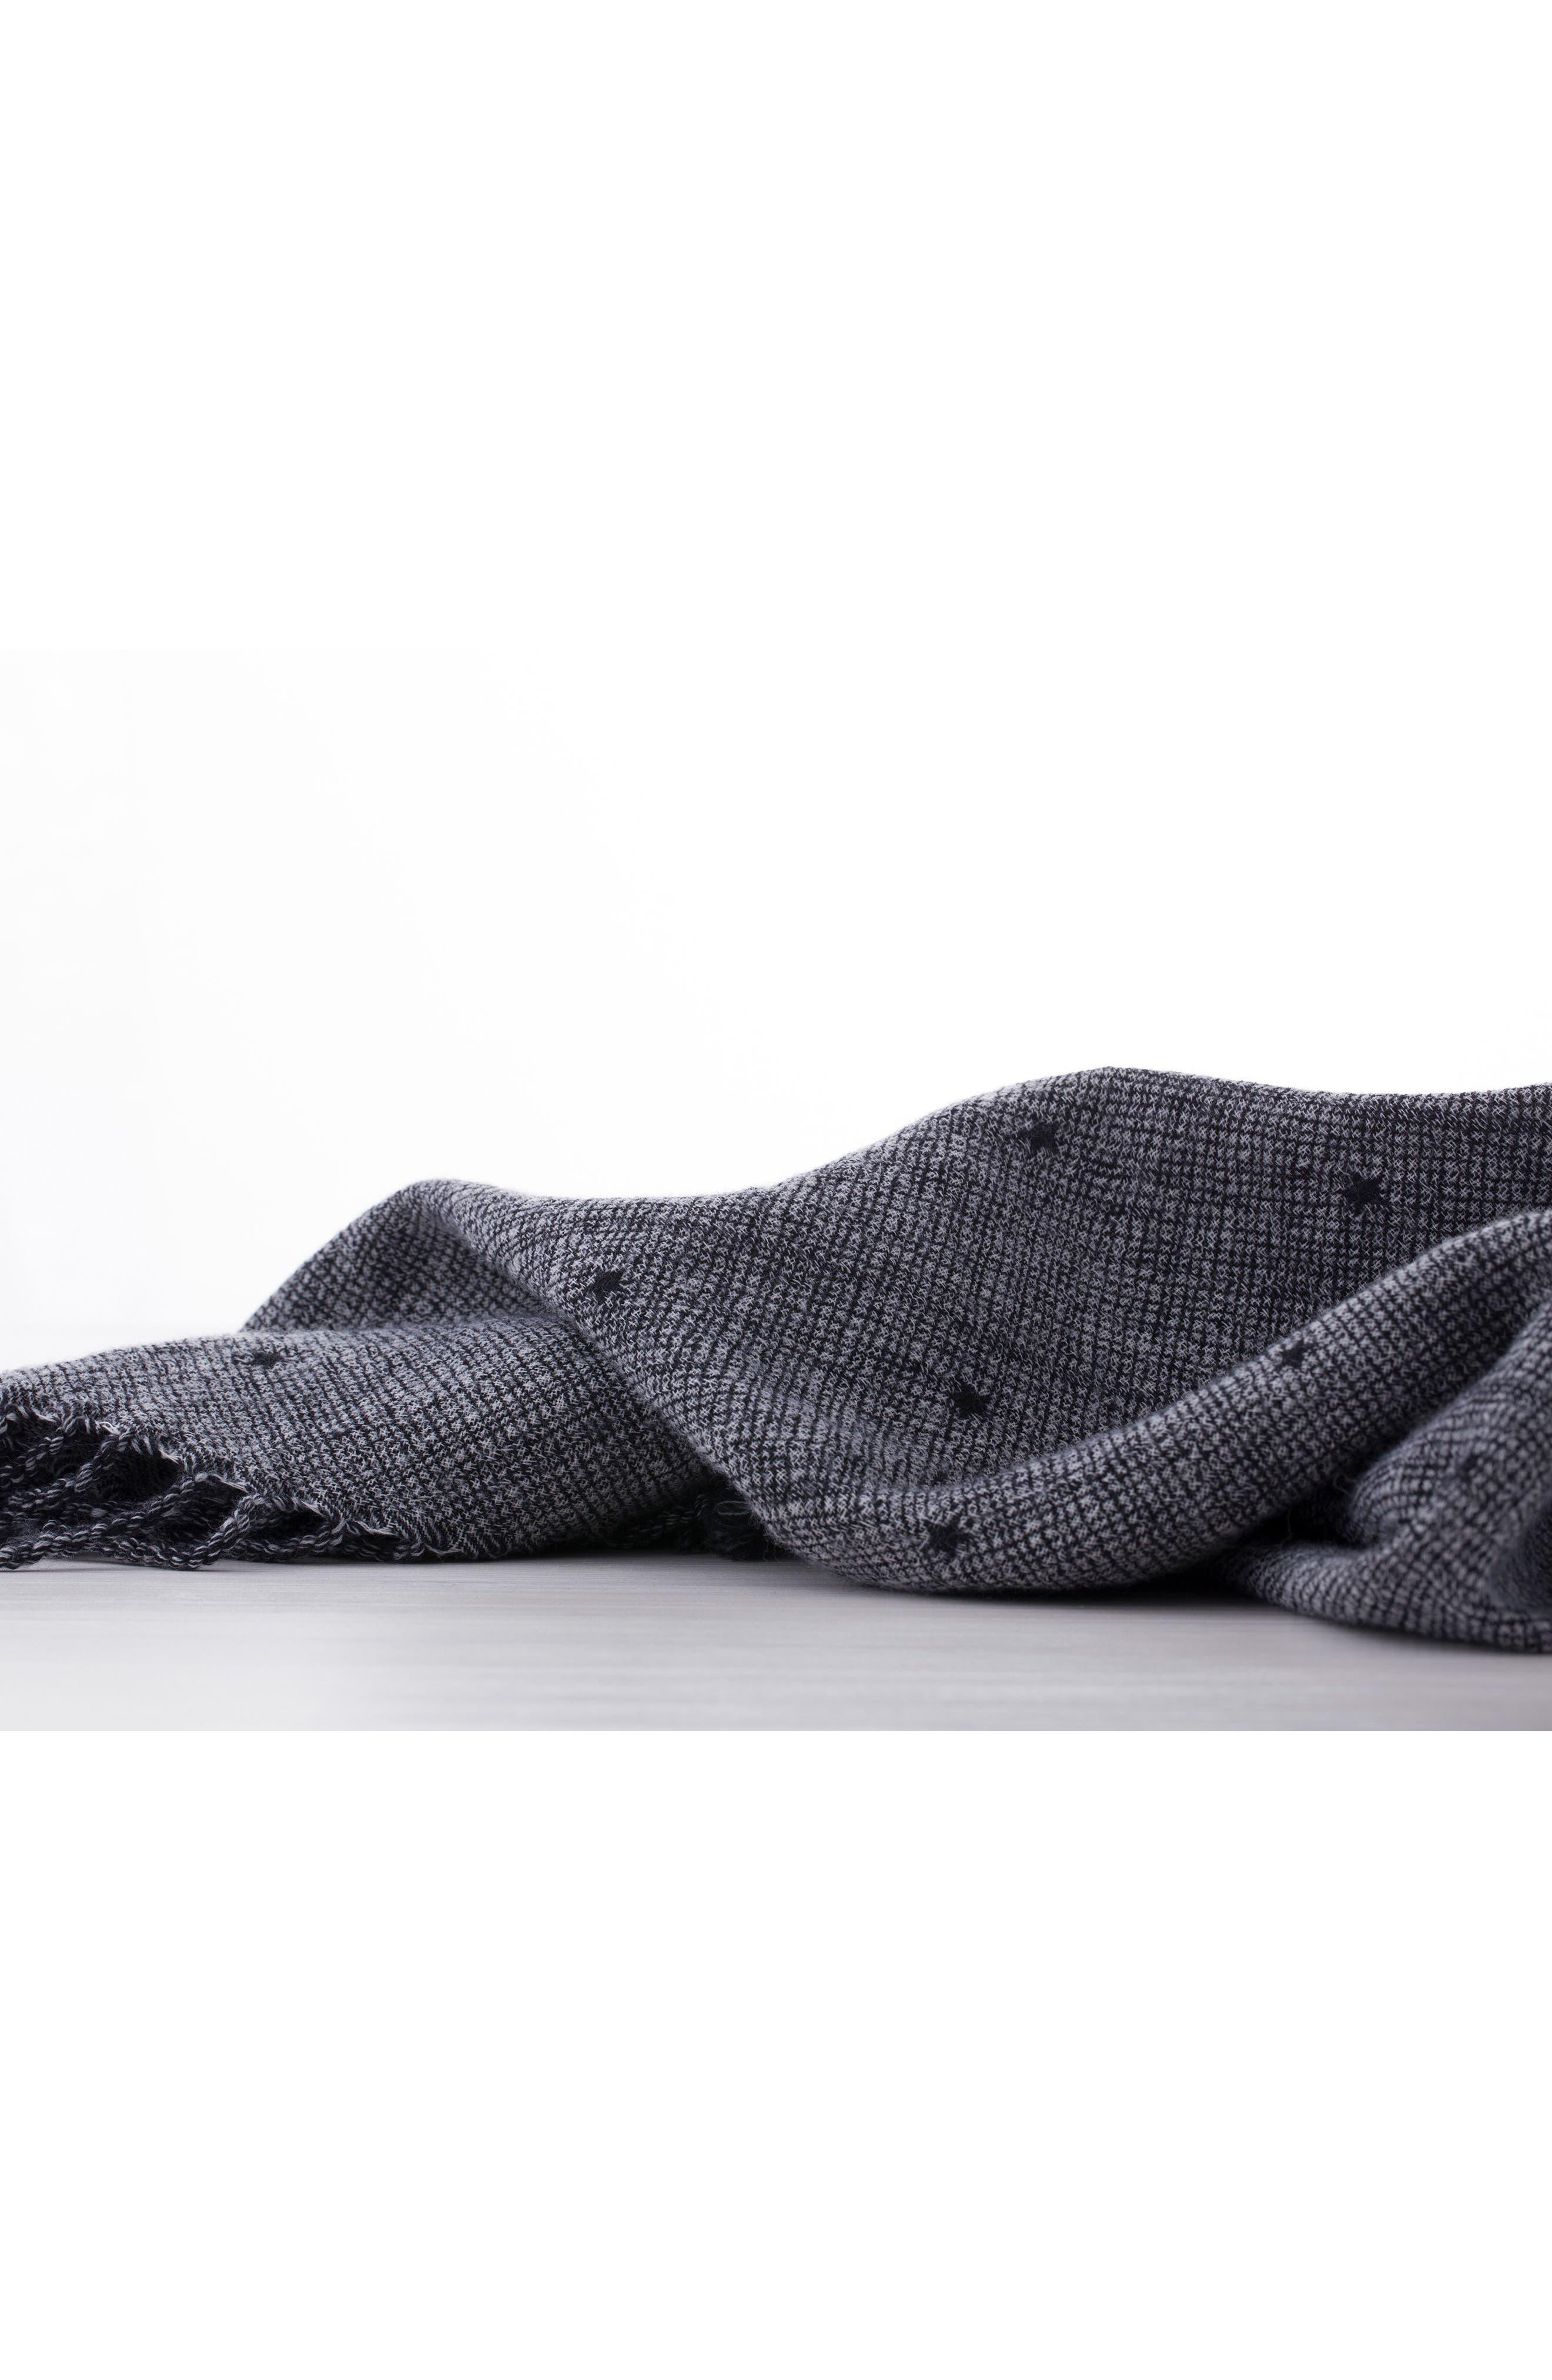 Blackstar Double Face Merino Wool Throw,                             Alternate thumbnail 3, color,                             BLACKSTAR